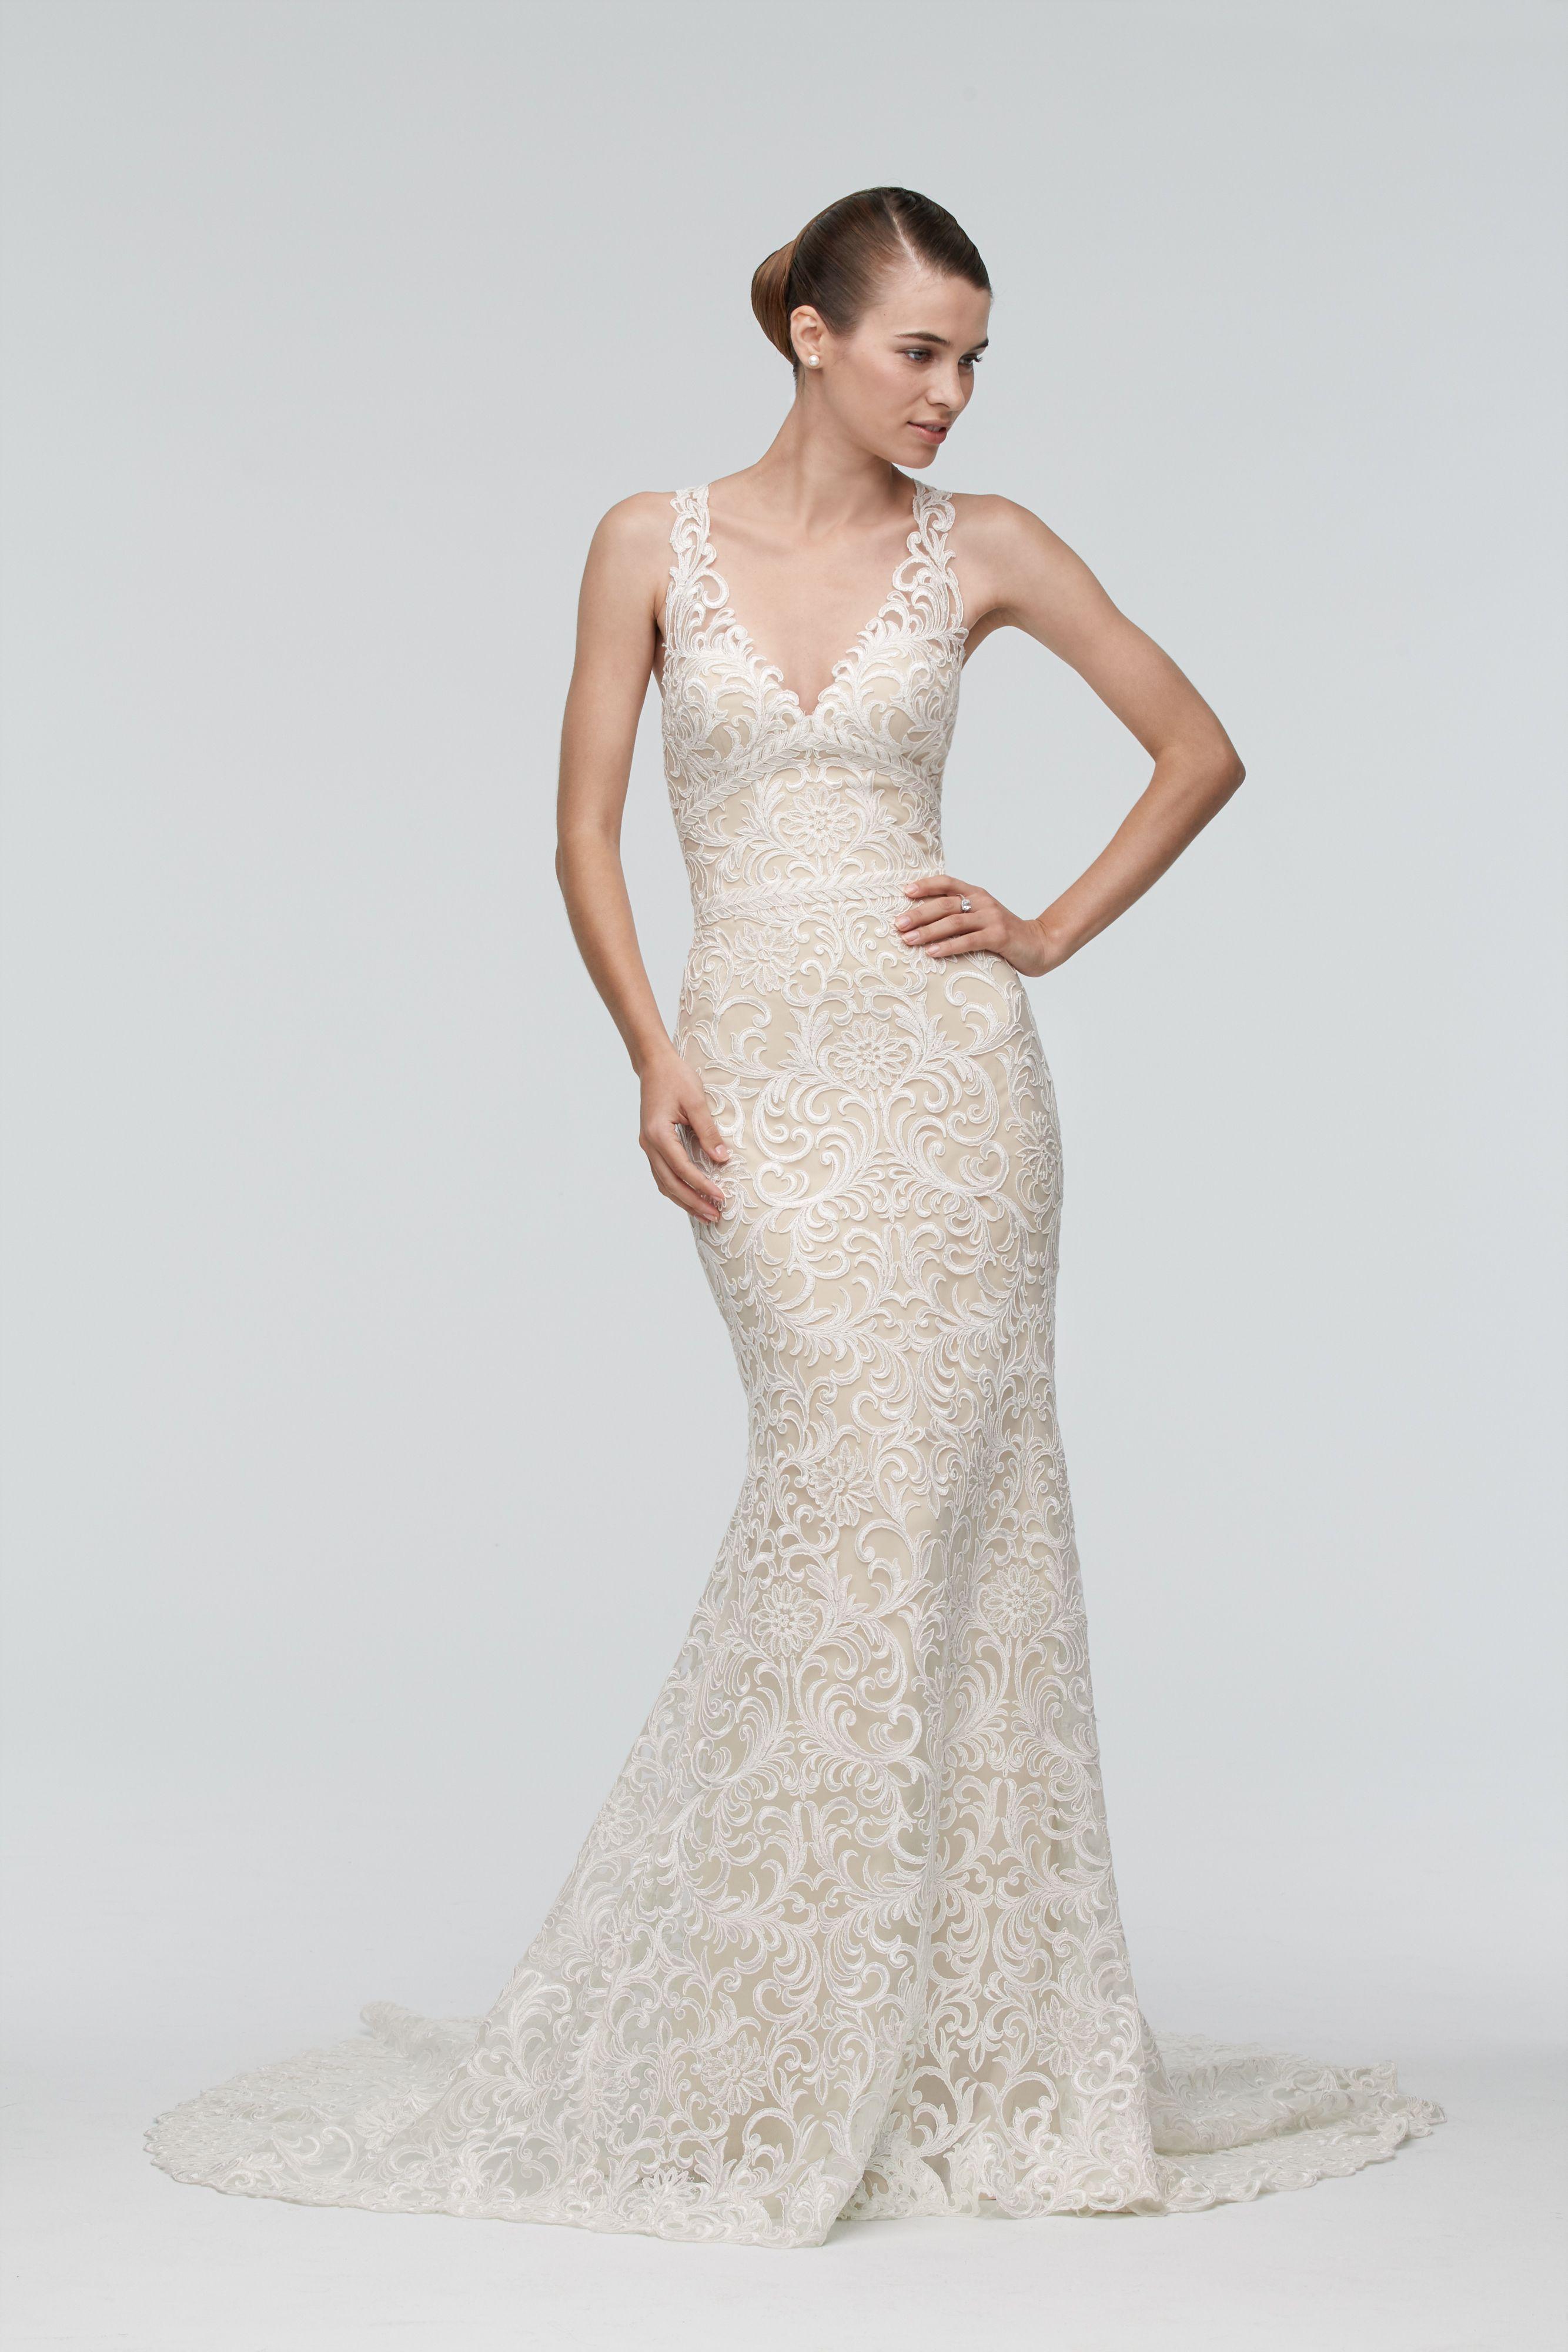 Ivory/natural Minuet Gown   BHLDN   Tadashi shoji wedding